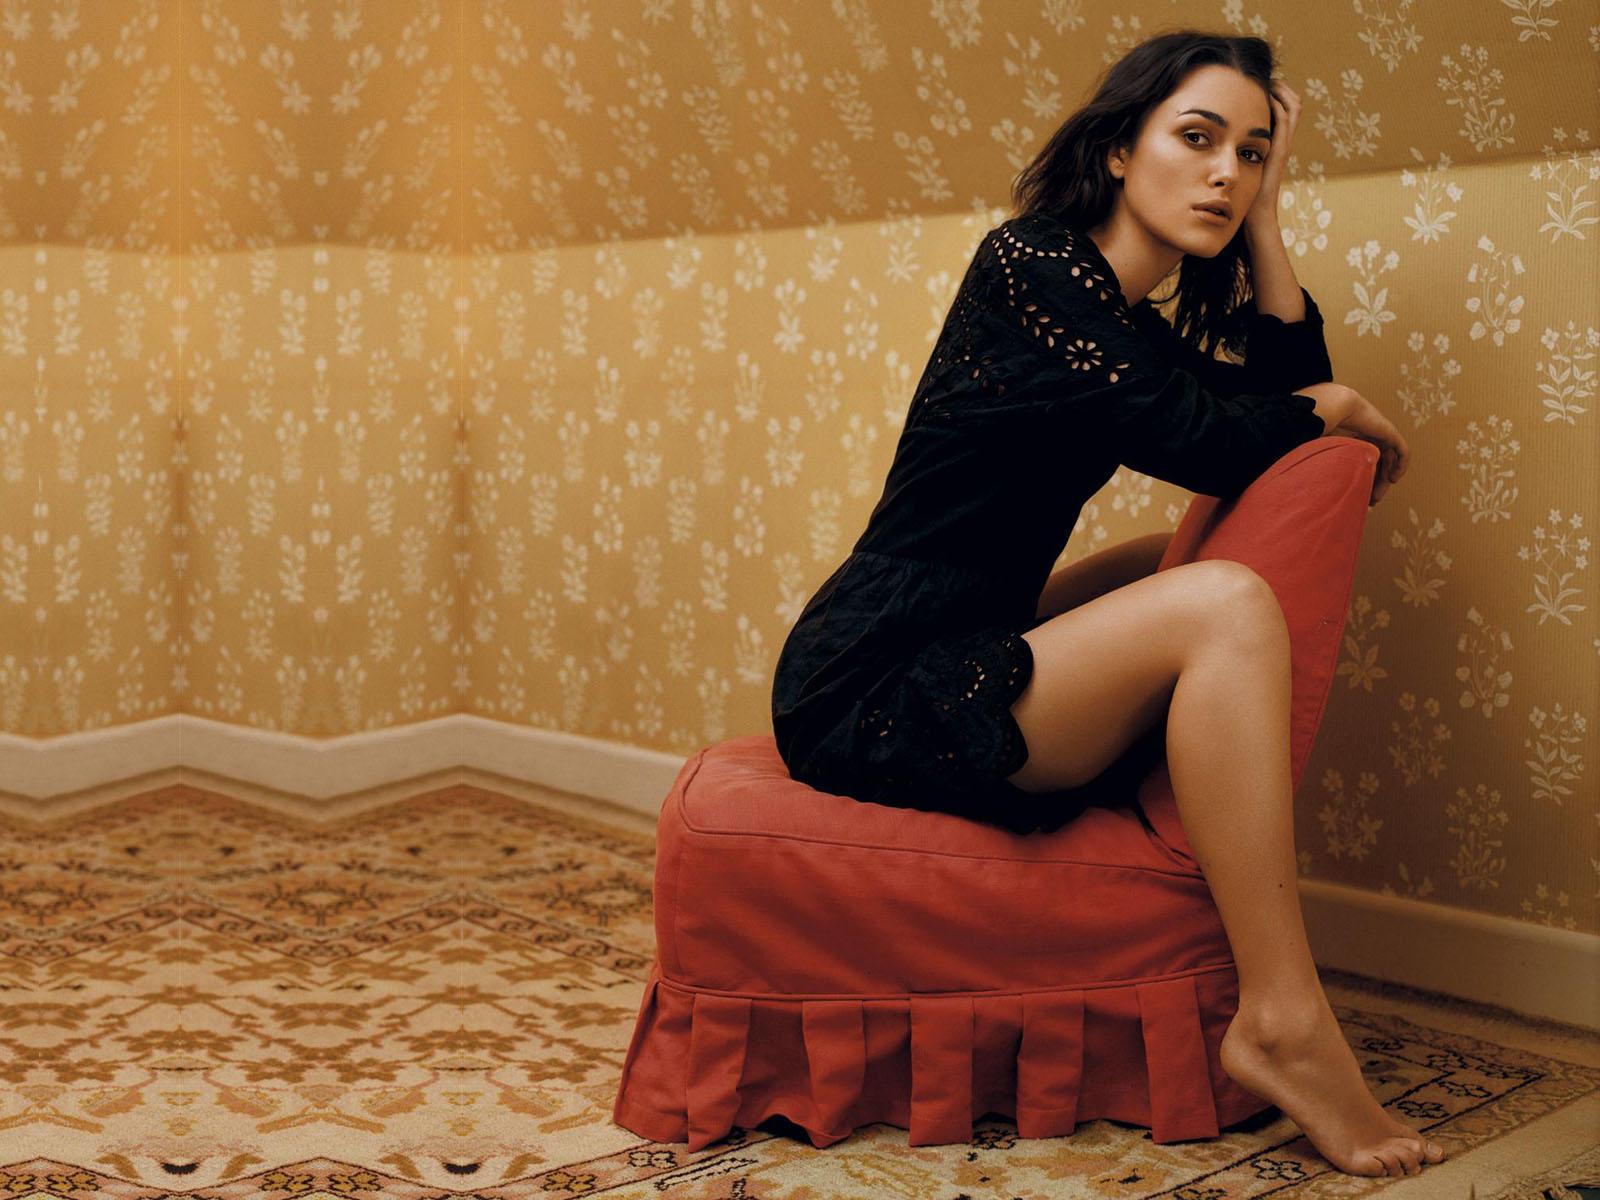 Diora Baird Full hd wallpapers